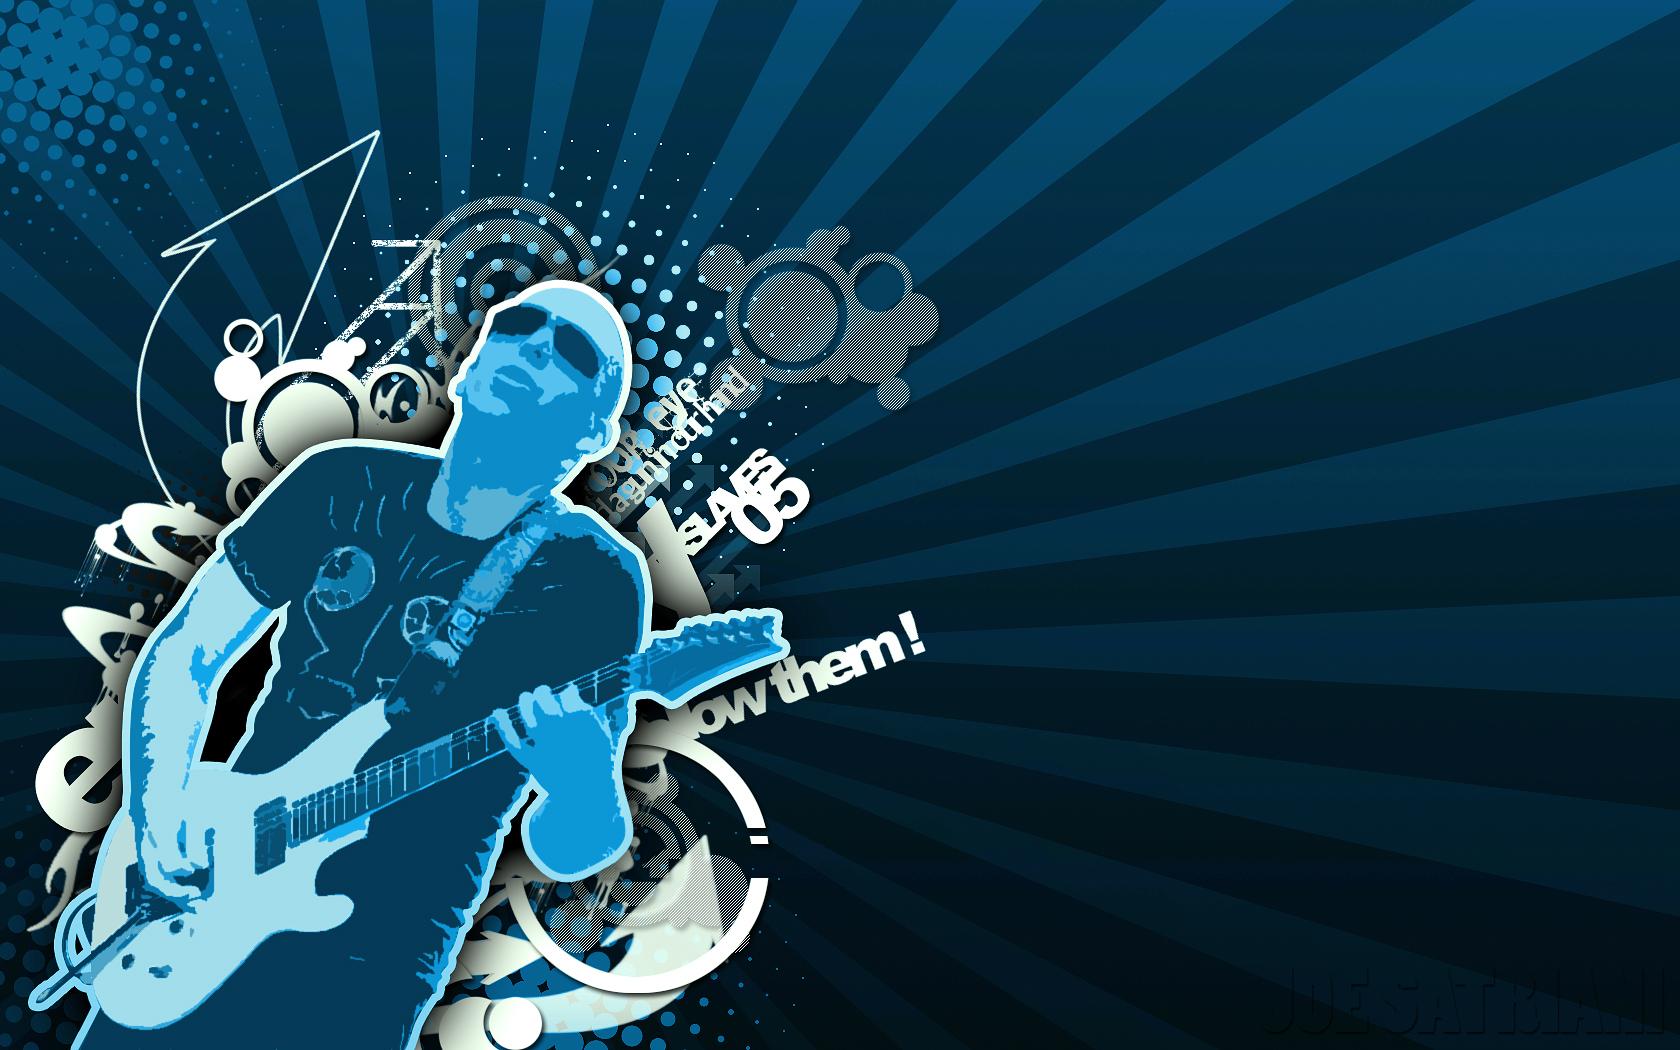 Joe Satriani Computer Wallpapers Desktop Backgrounds 1680x1050